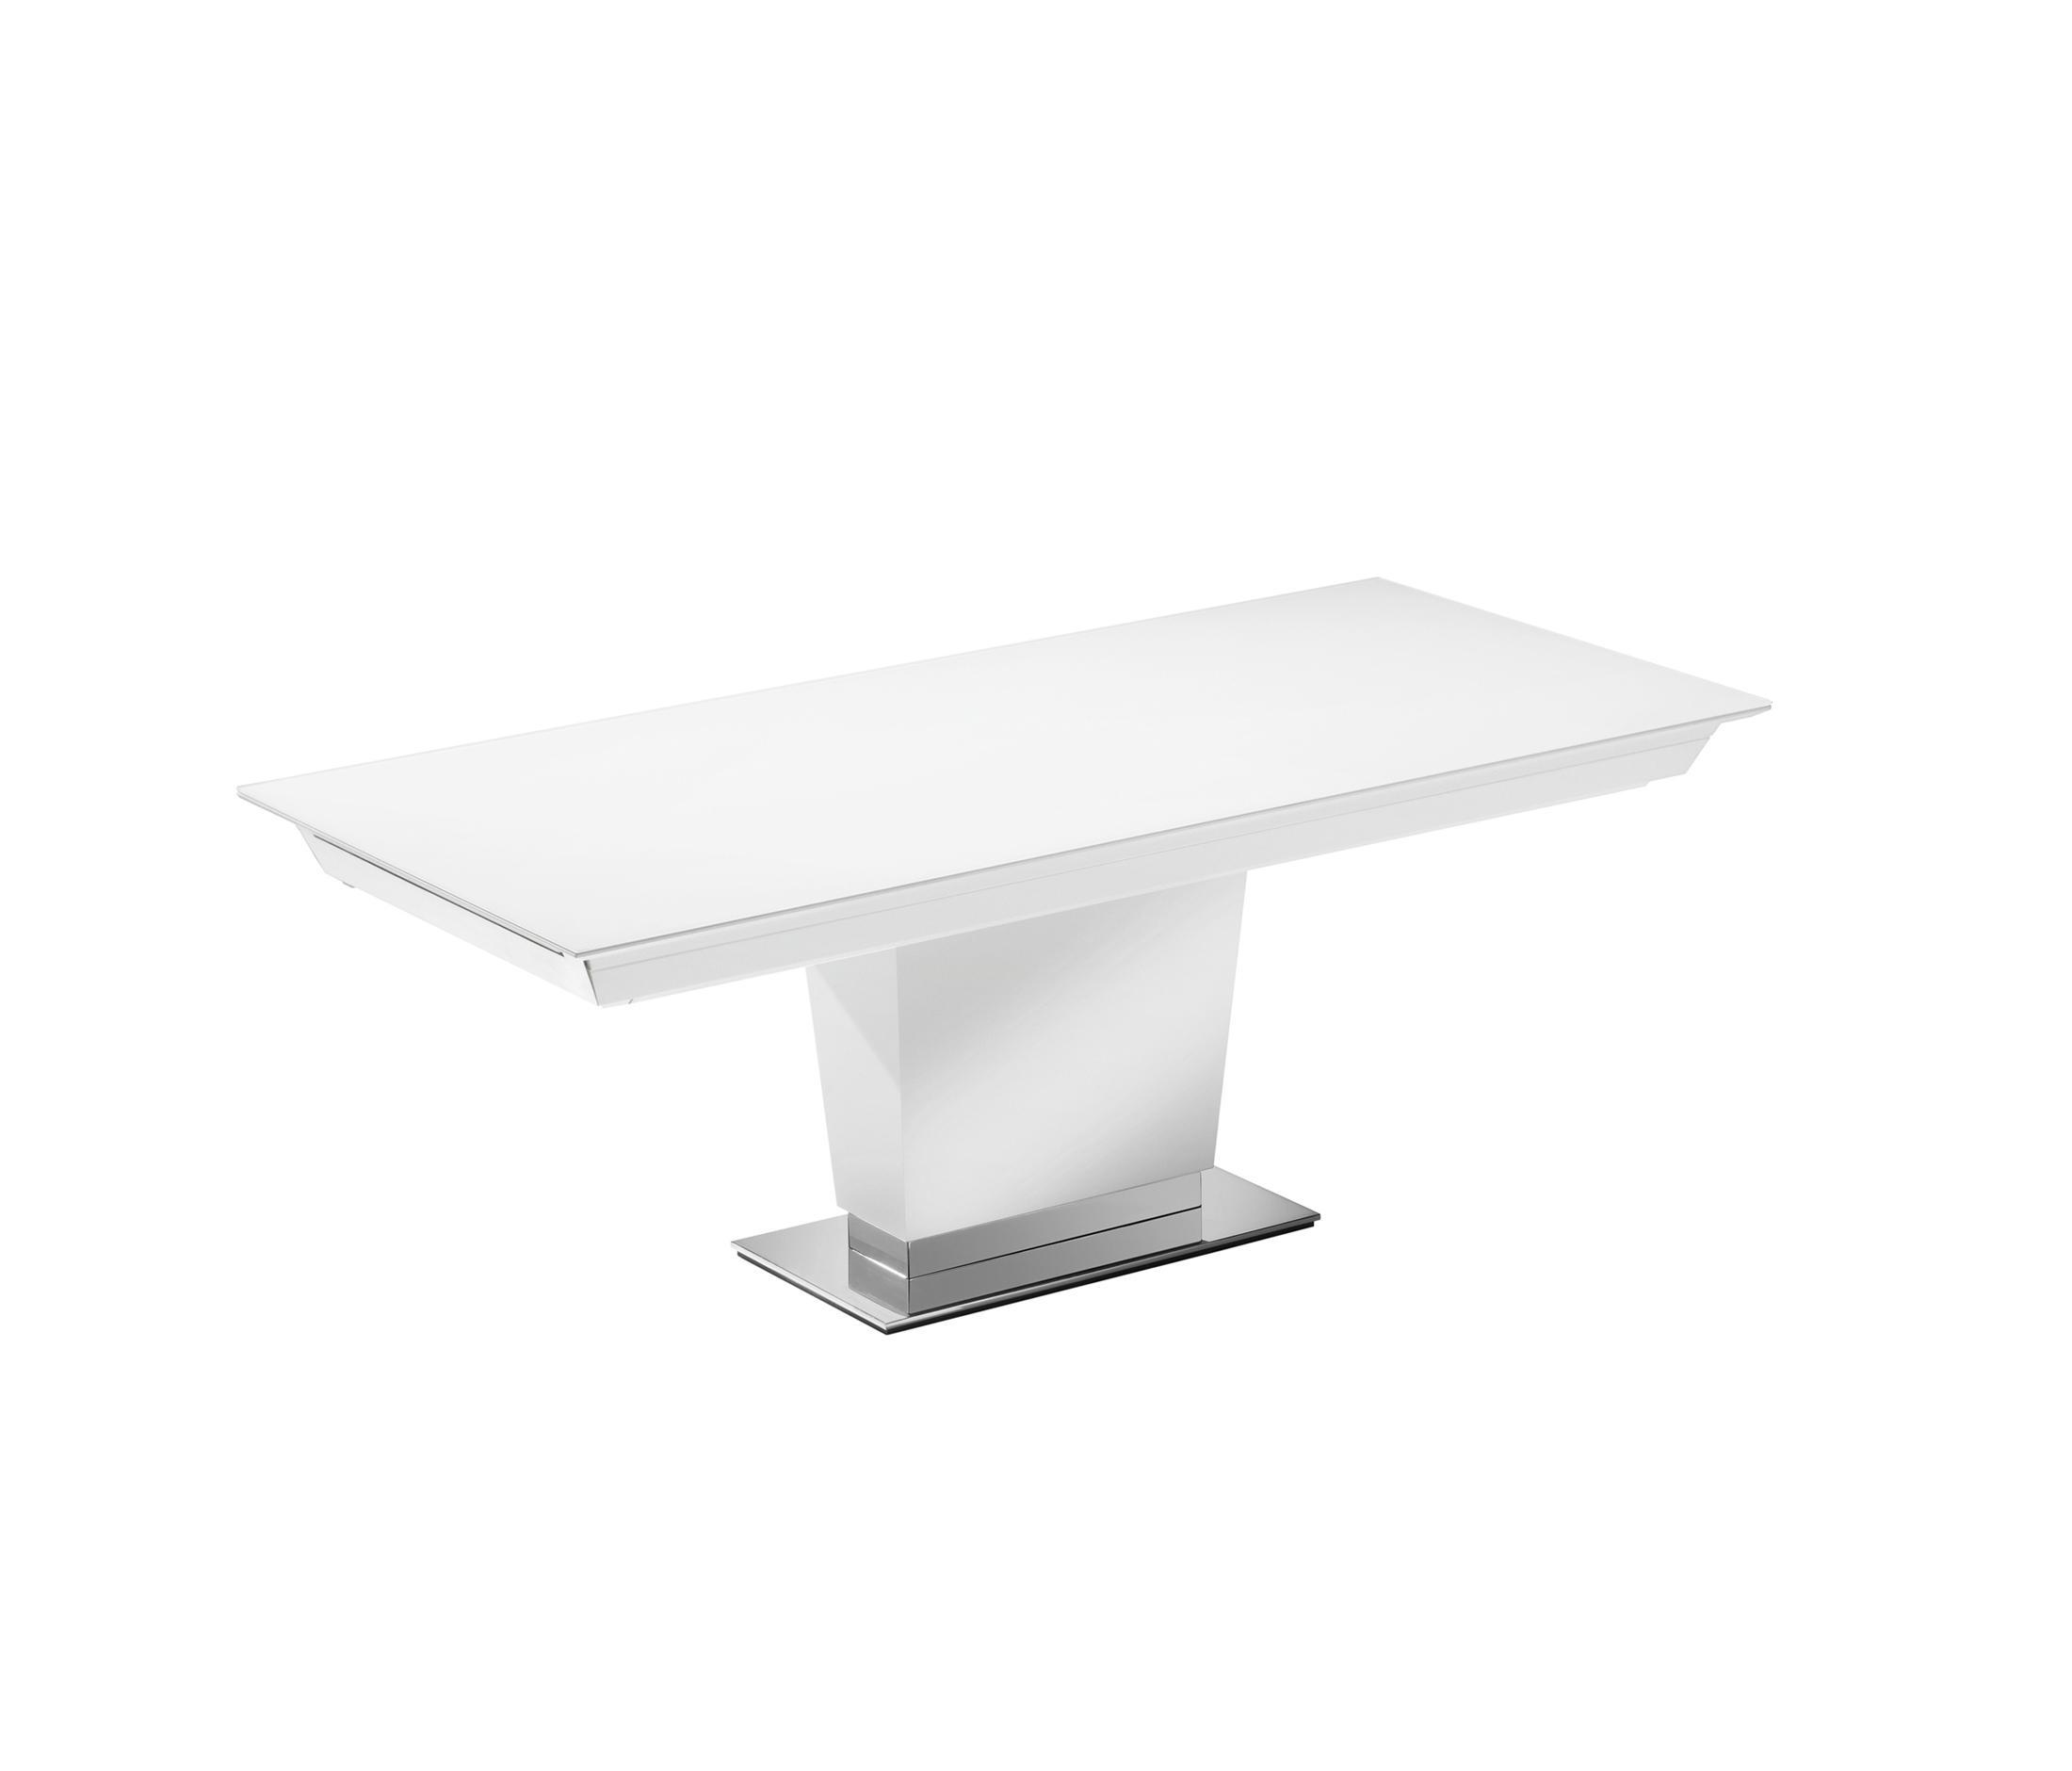 Nova dining table tavoli da pranzo die collection for Produttori tavoli